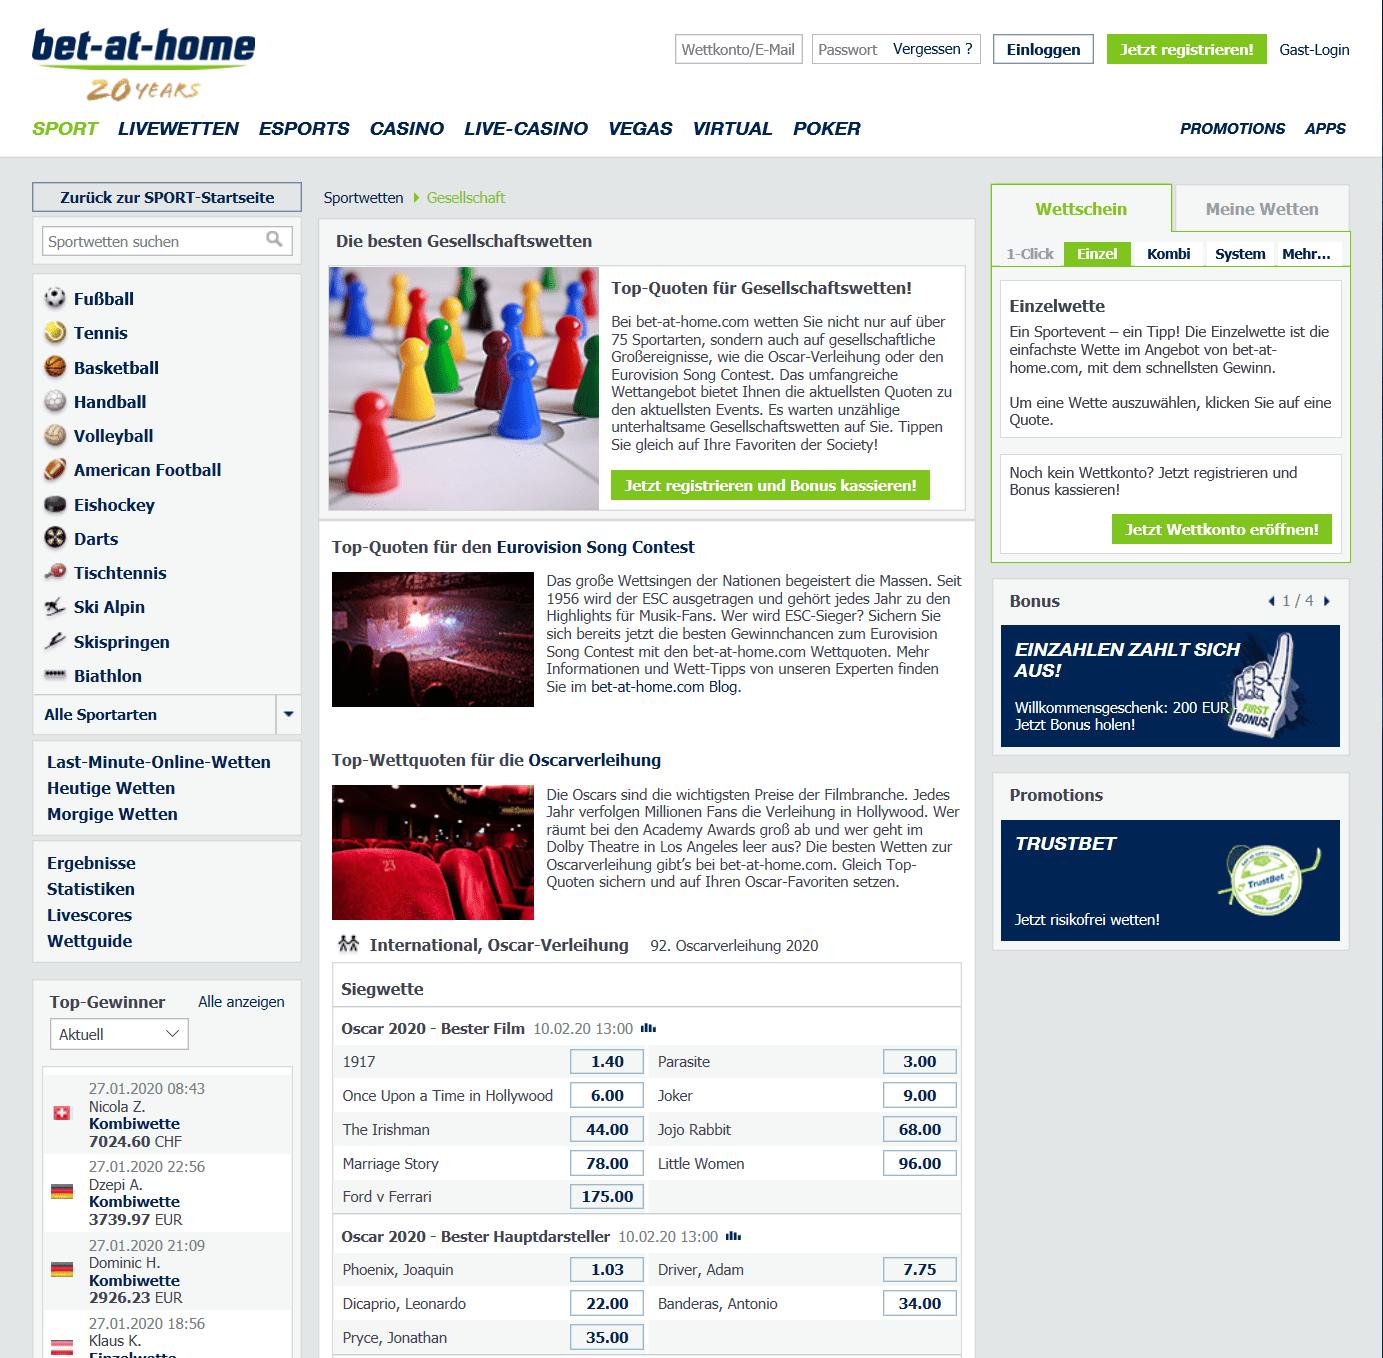 bet-at-home Gesellschaftswette